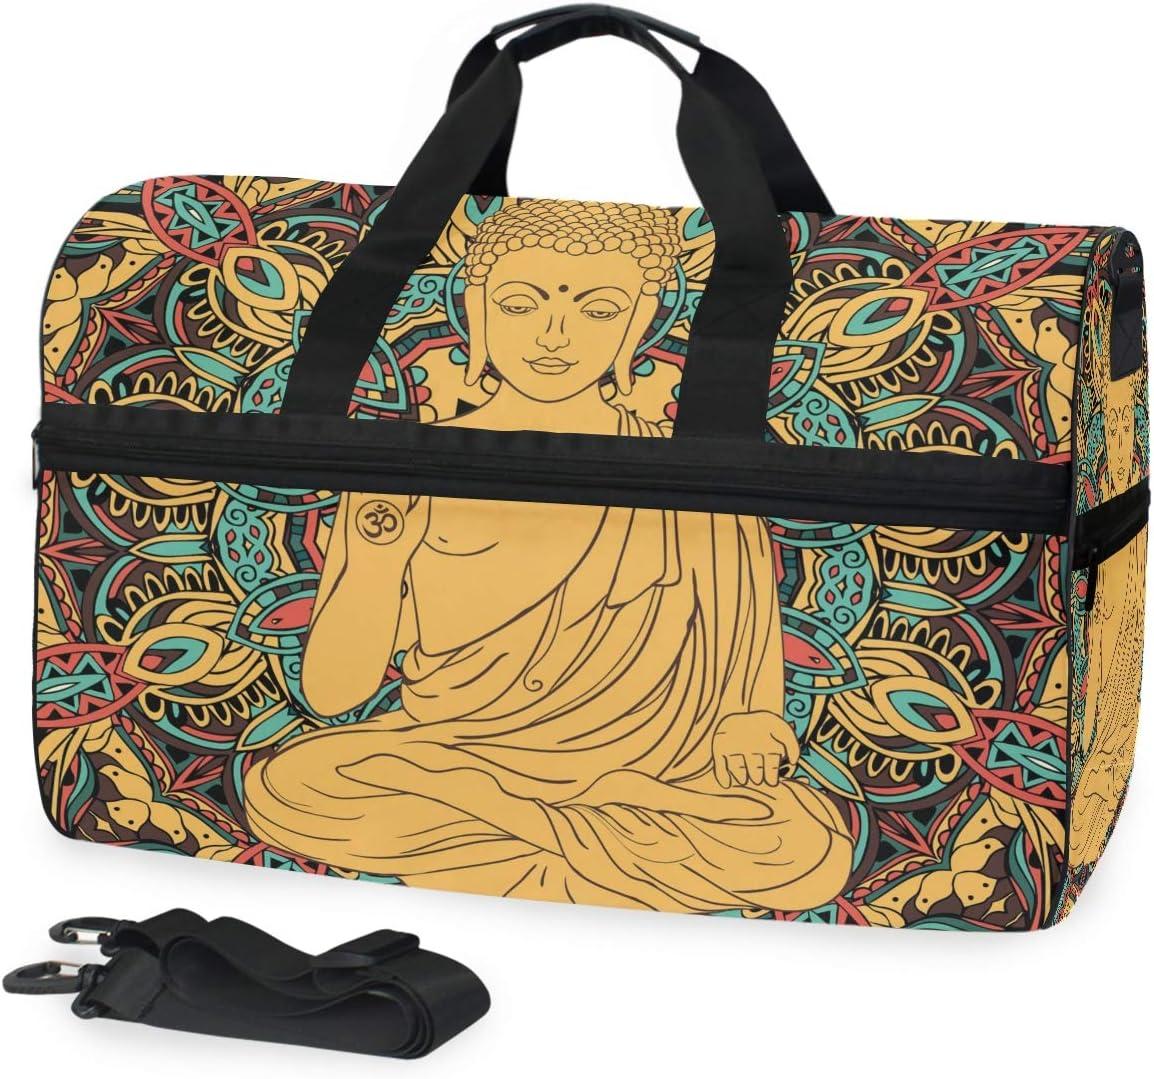 Montoj - Bolsa de Viaje con diseño de Buda, con Correa Ajustable